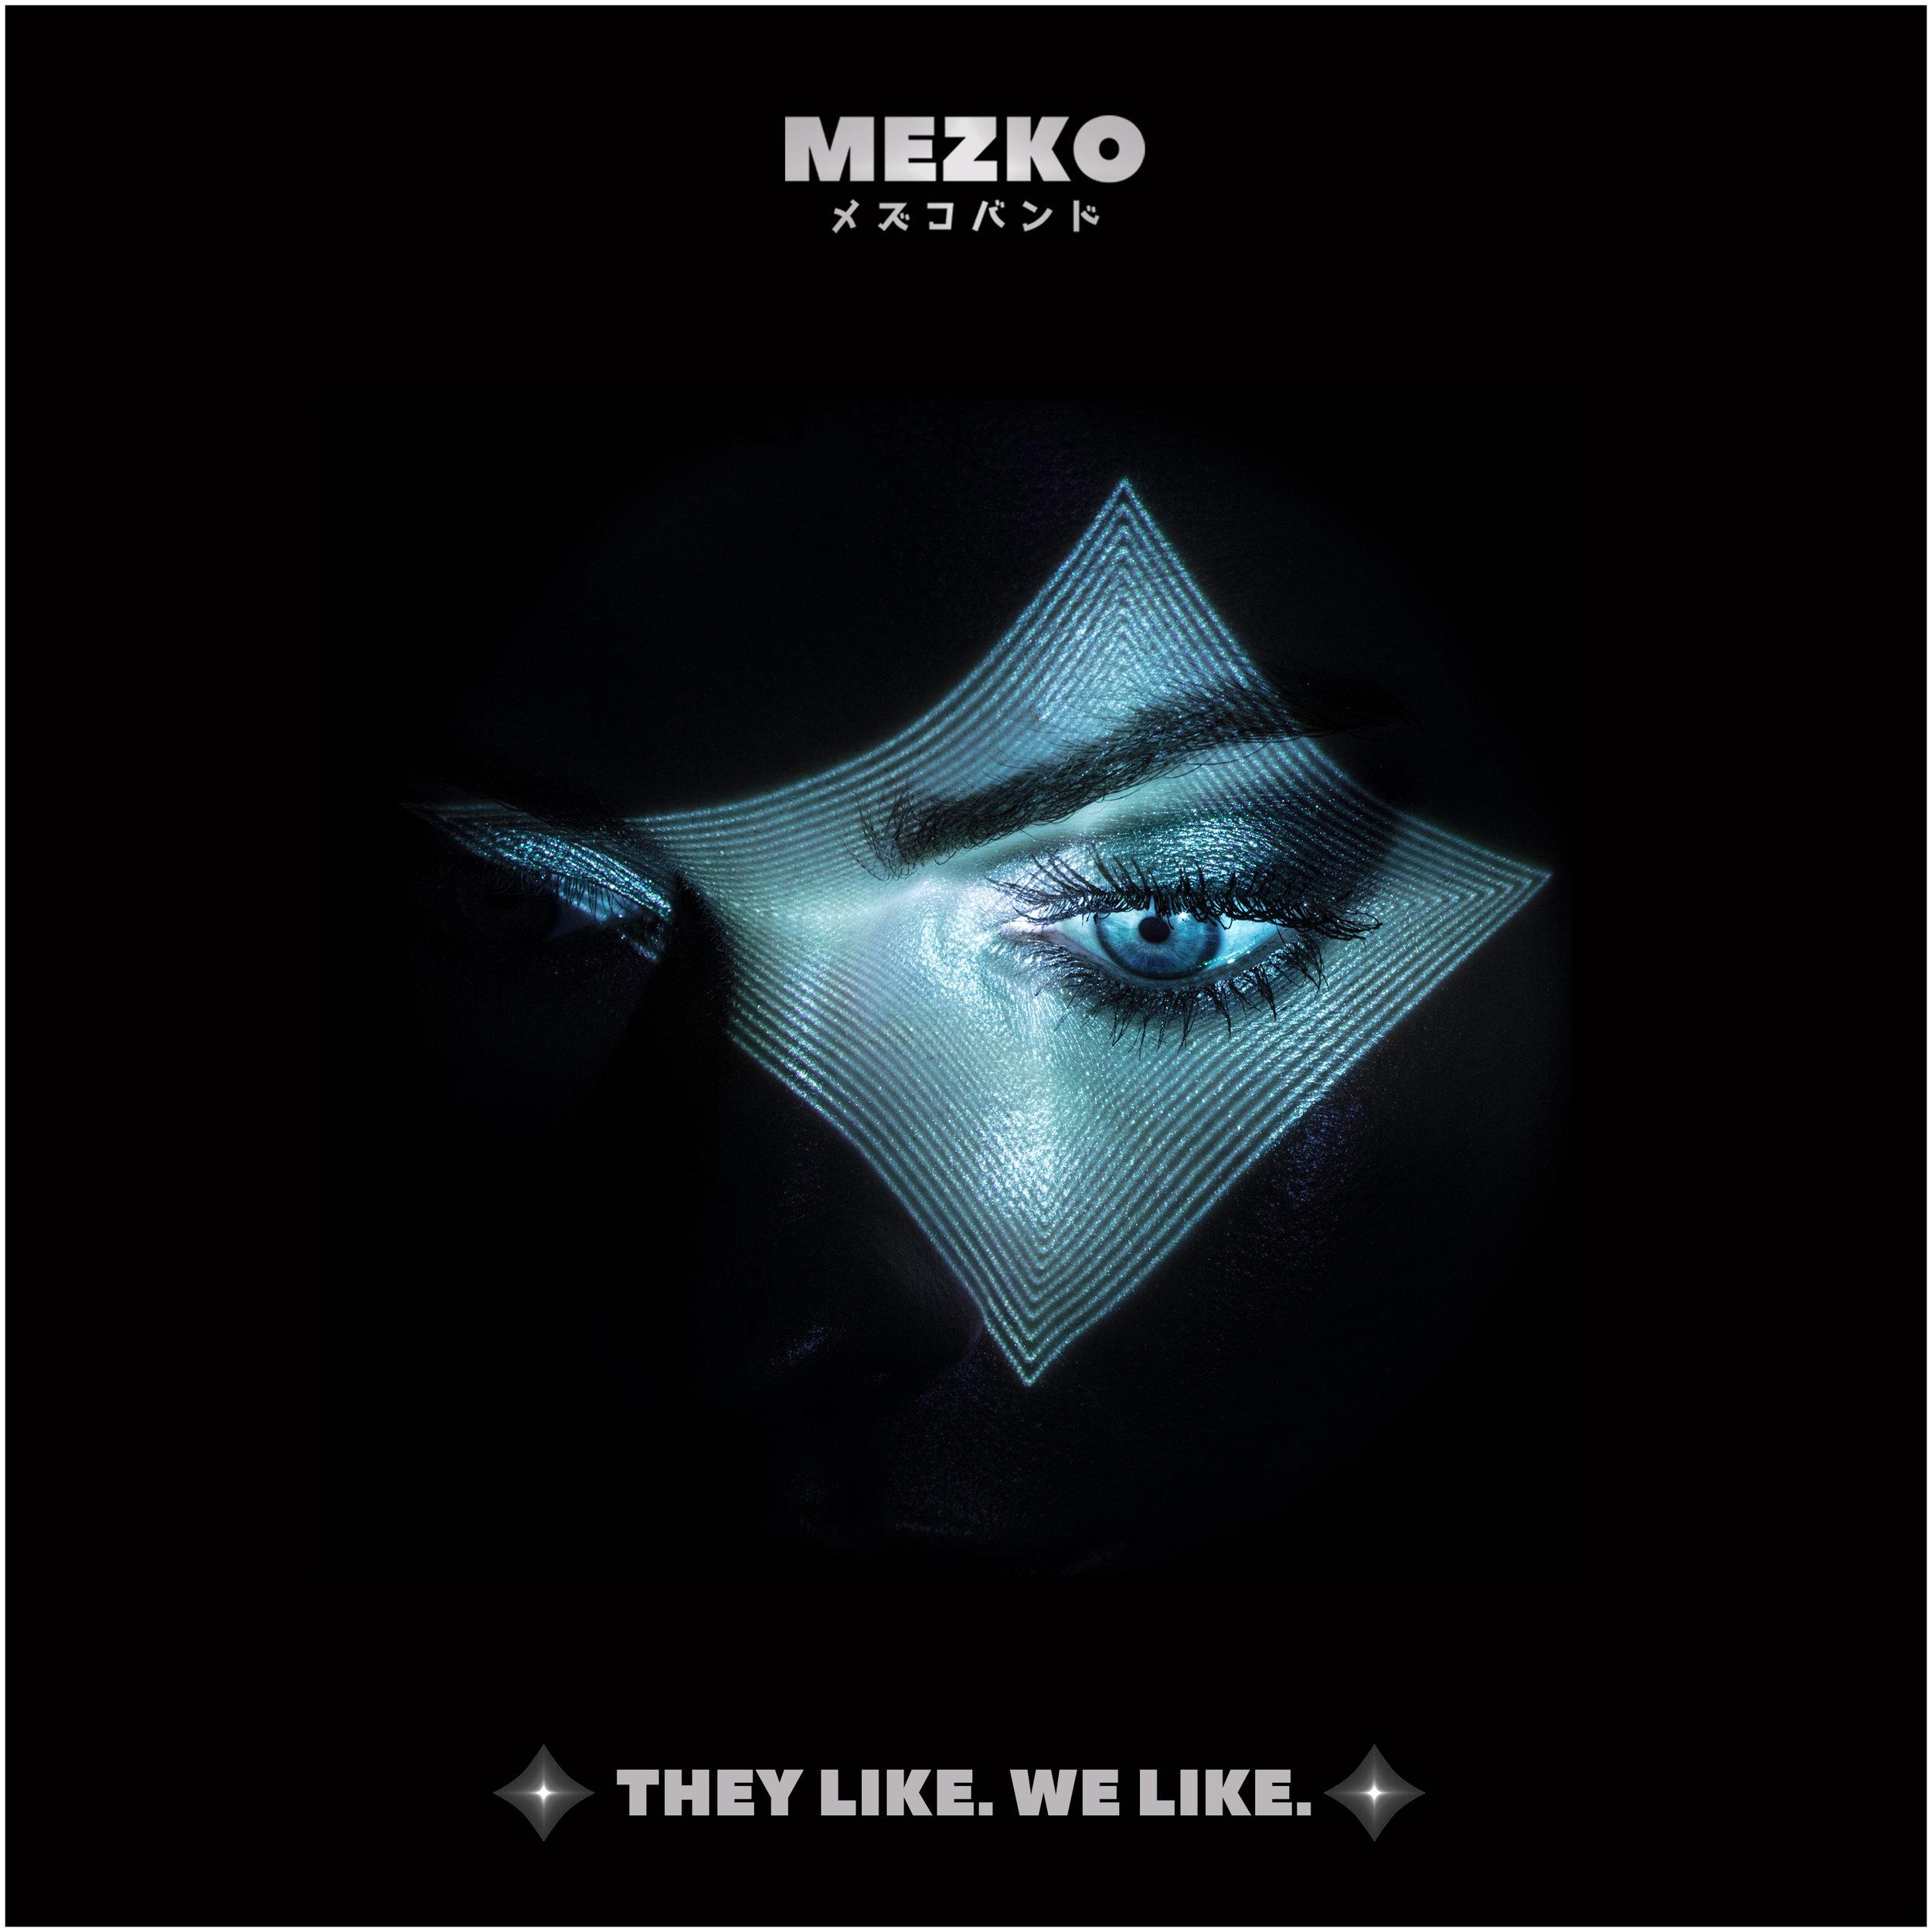 MEZKO - THEY LIKE WE LIKE COVER.jpg